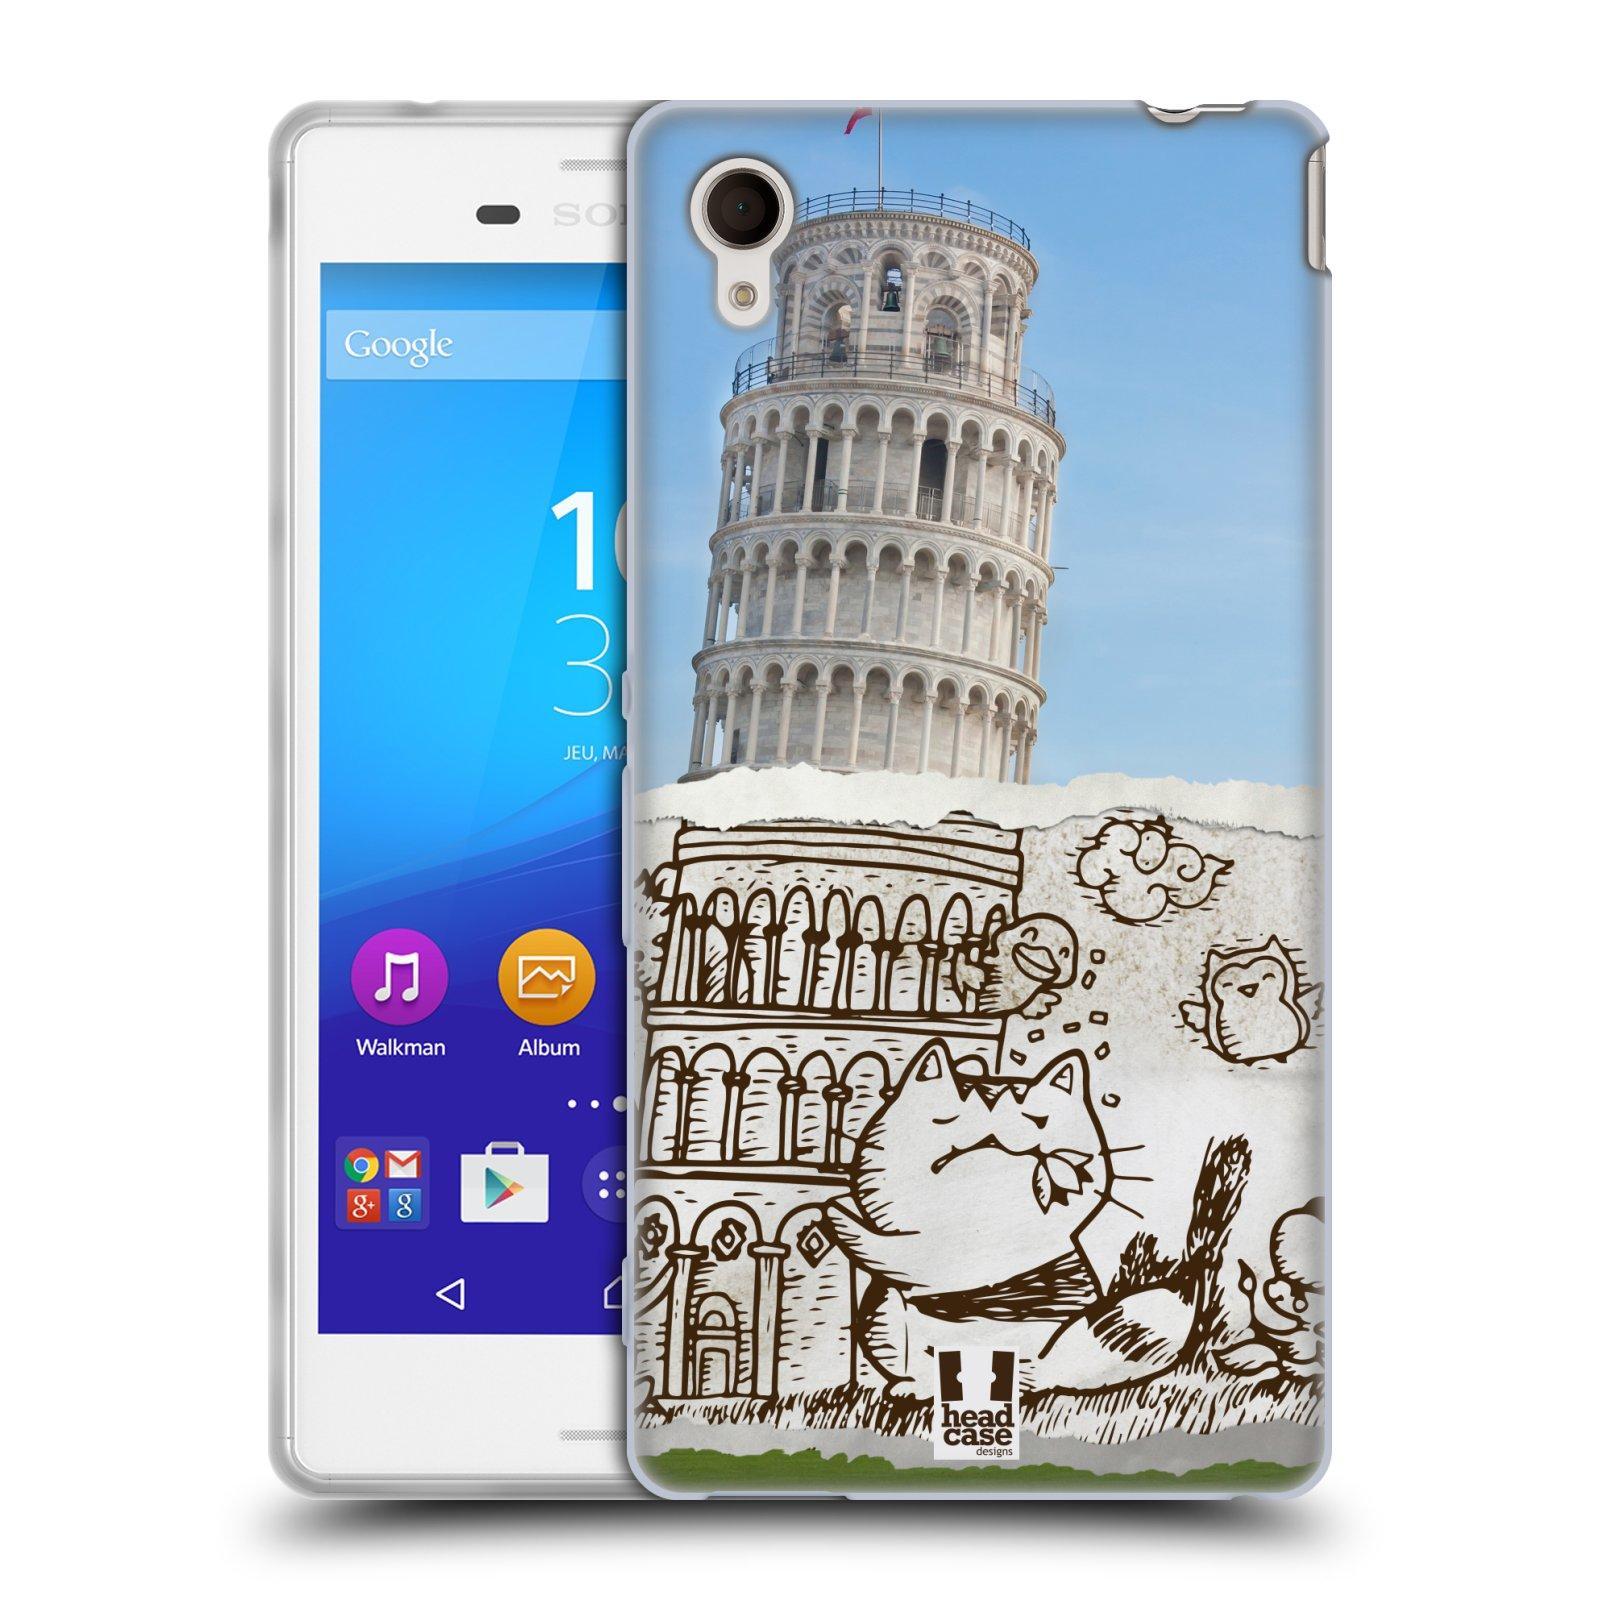 Silikonové pouzdro na mobil Sony Xperia M4 Aqua E2303 HEAD CASE DOODLE TRIP PISA (Silikonový kryt či obal na mobilní telefon Sony Xperia M4 Aqua a M4 Aqua Dual SIM)